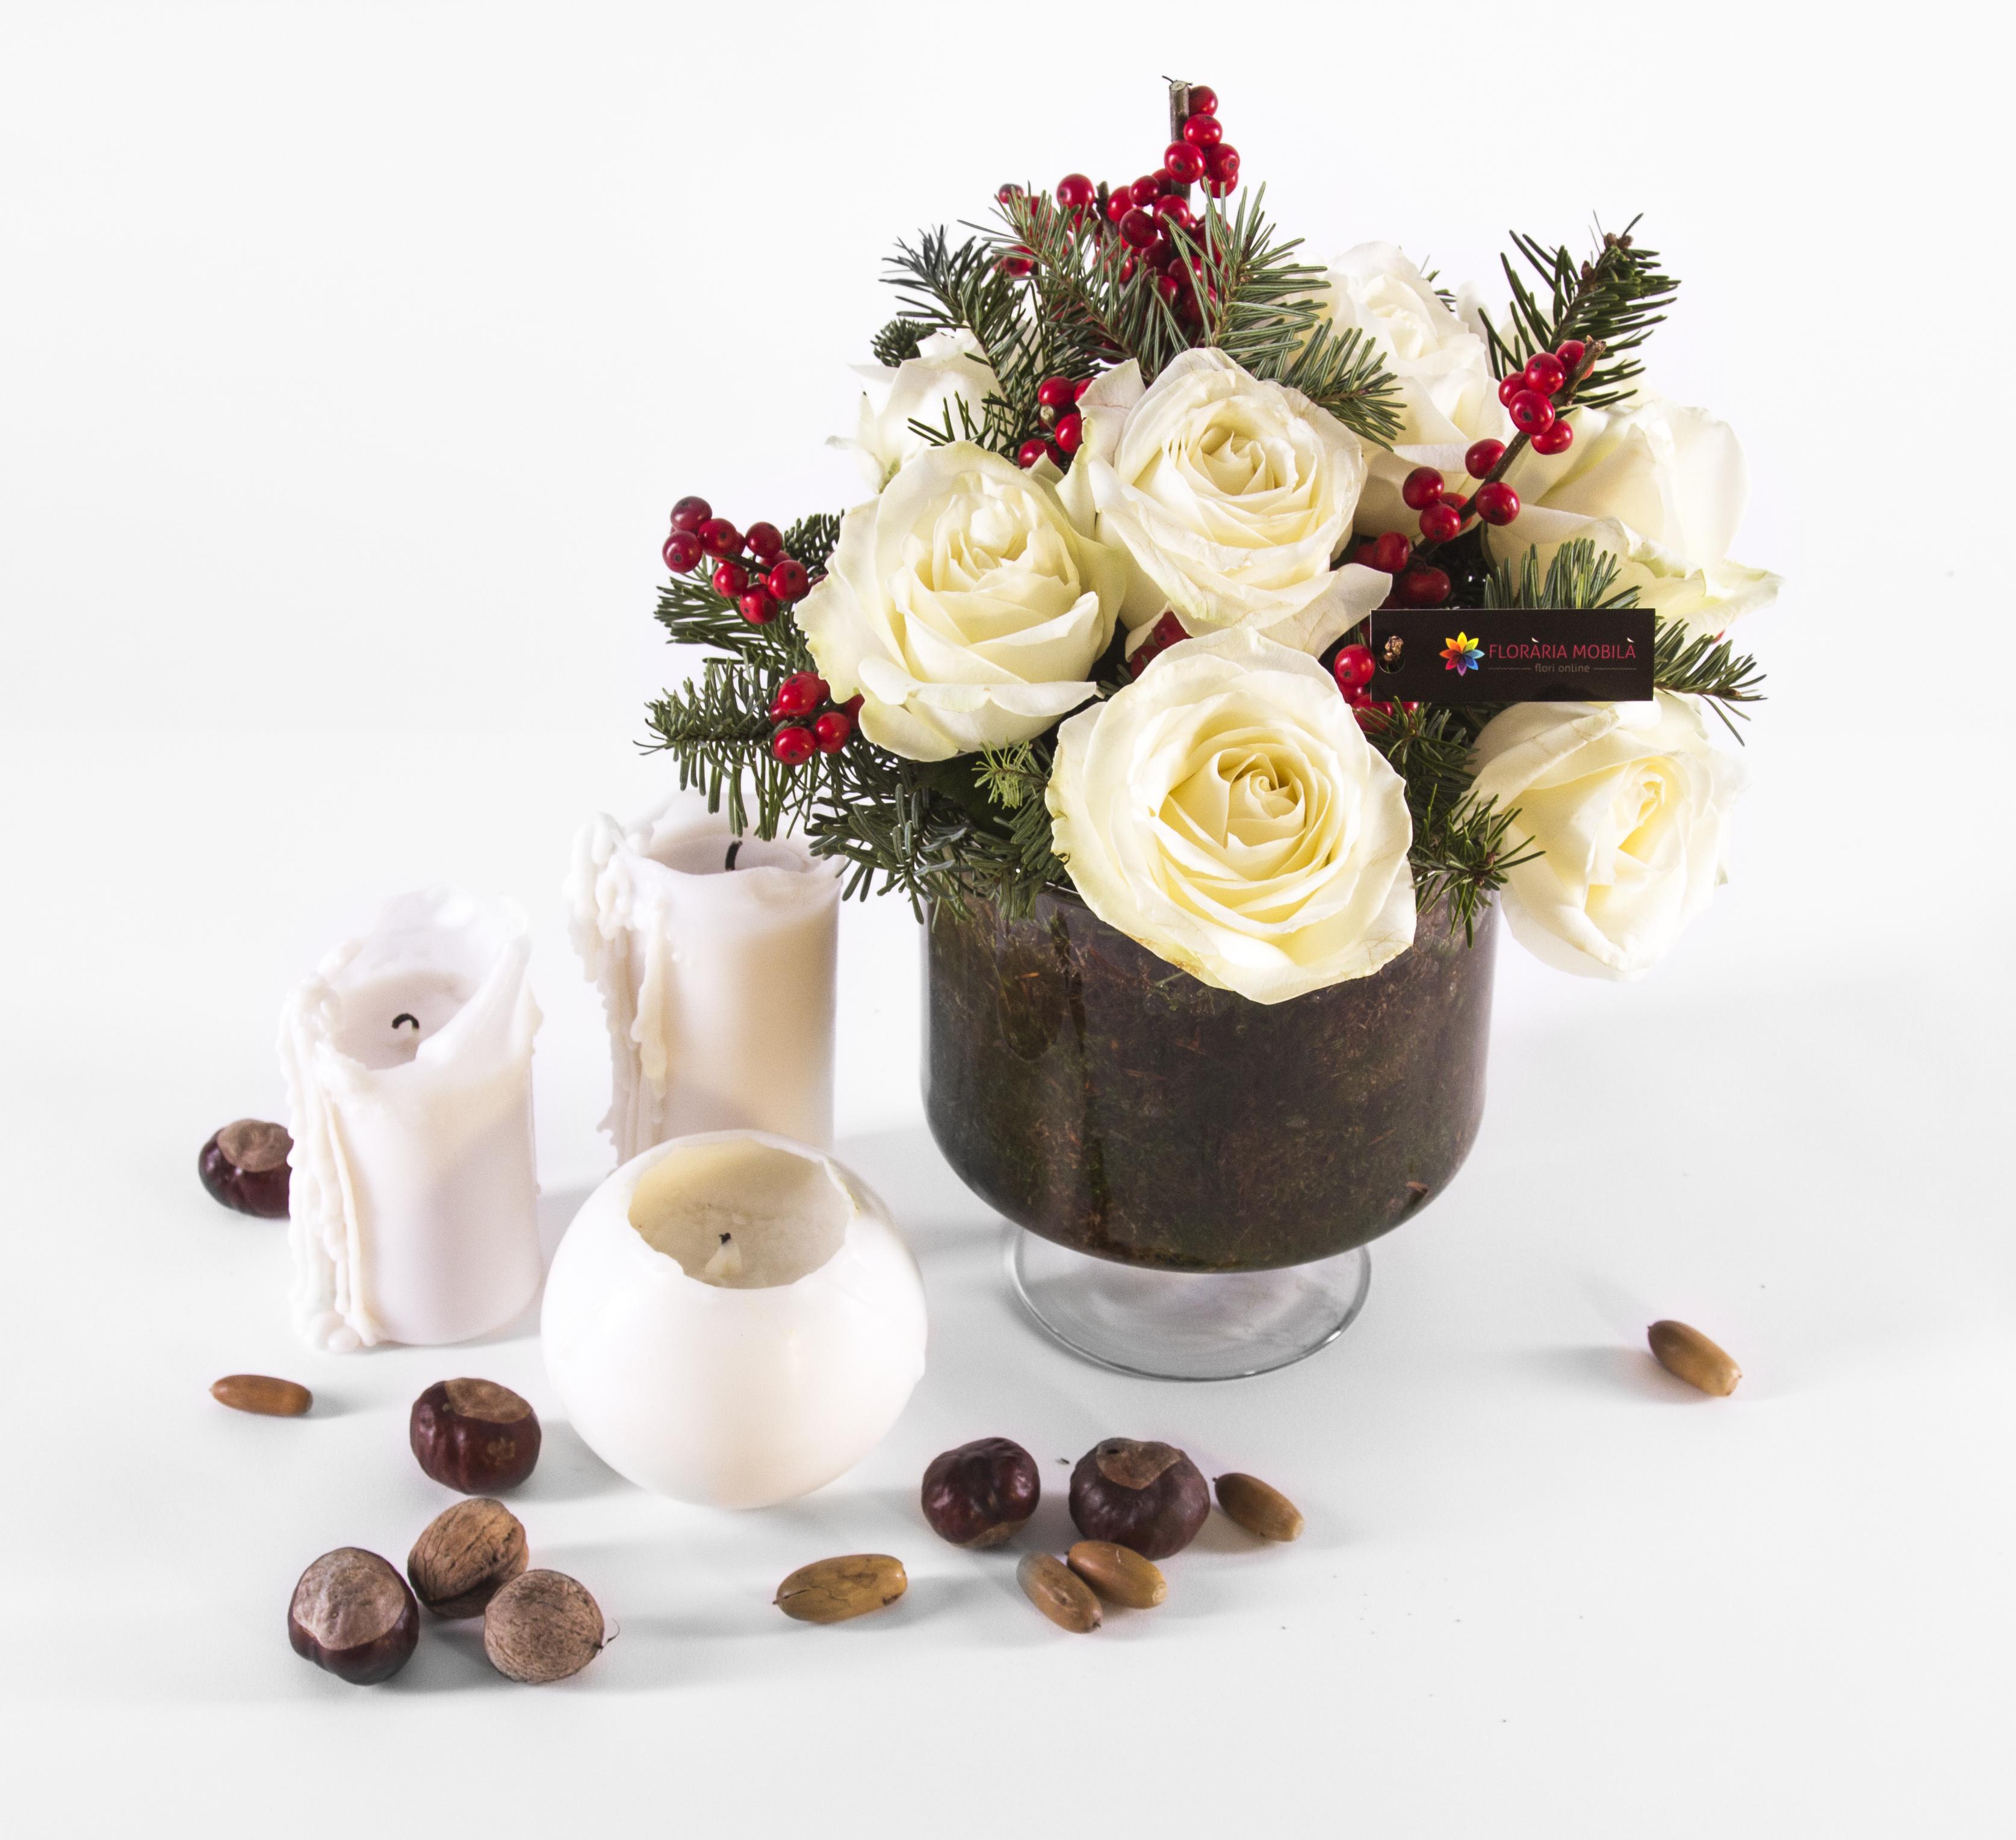 Floraria_Mobila_Aranjament_Craciun_165 lei (1)